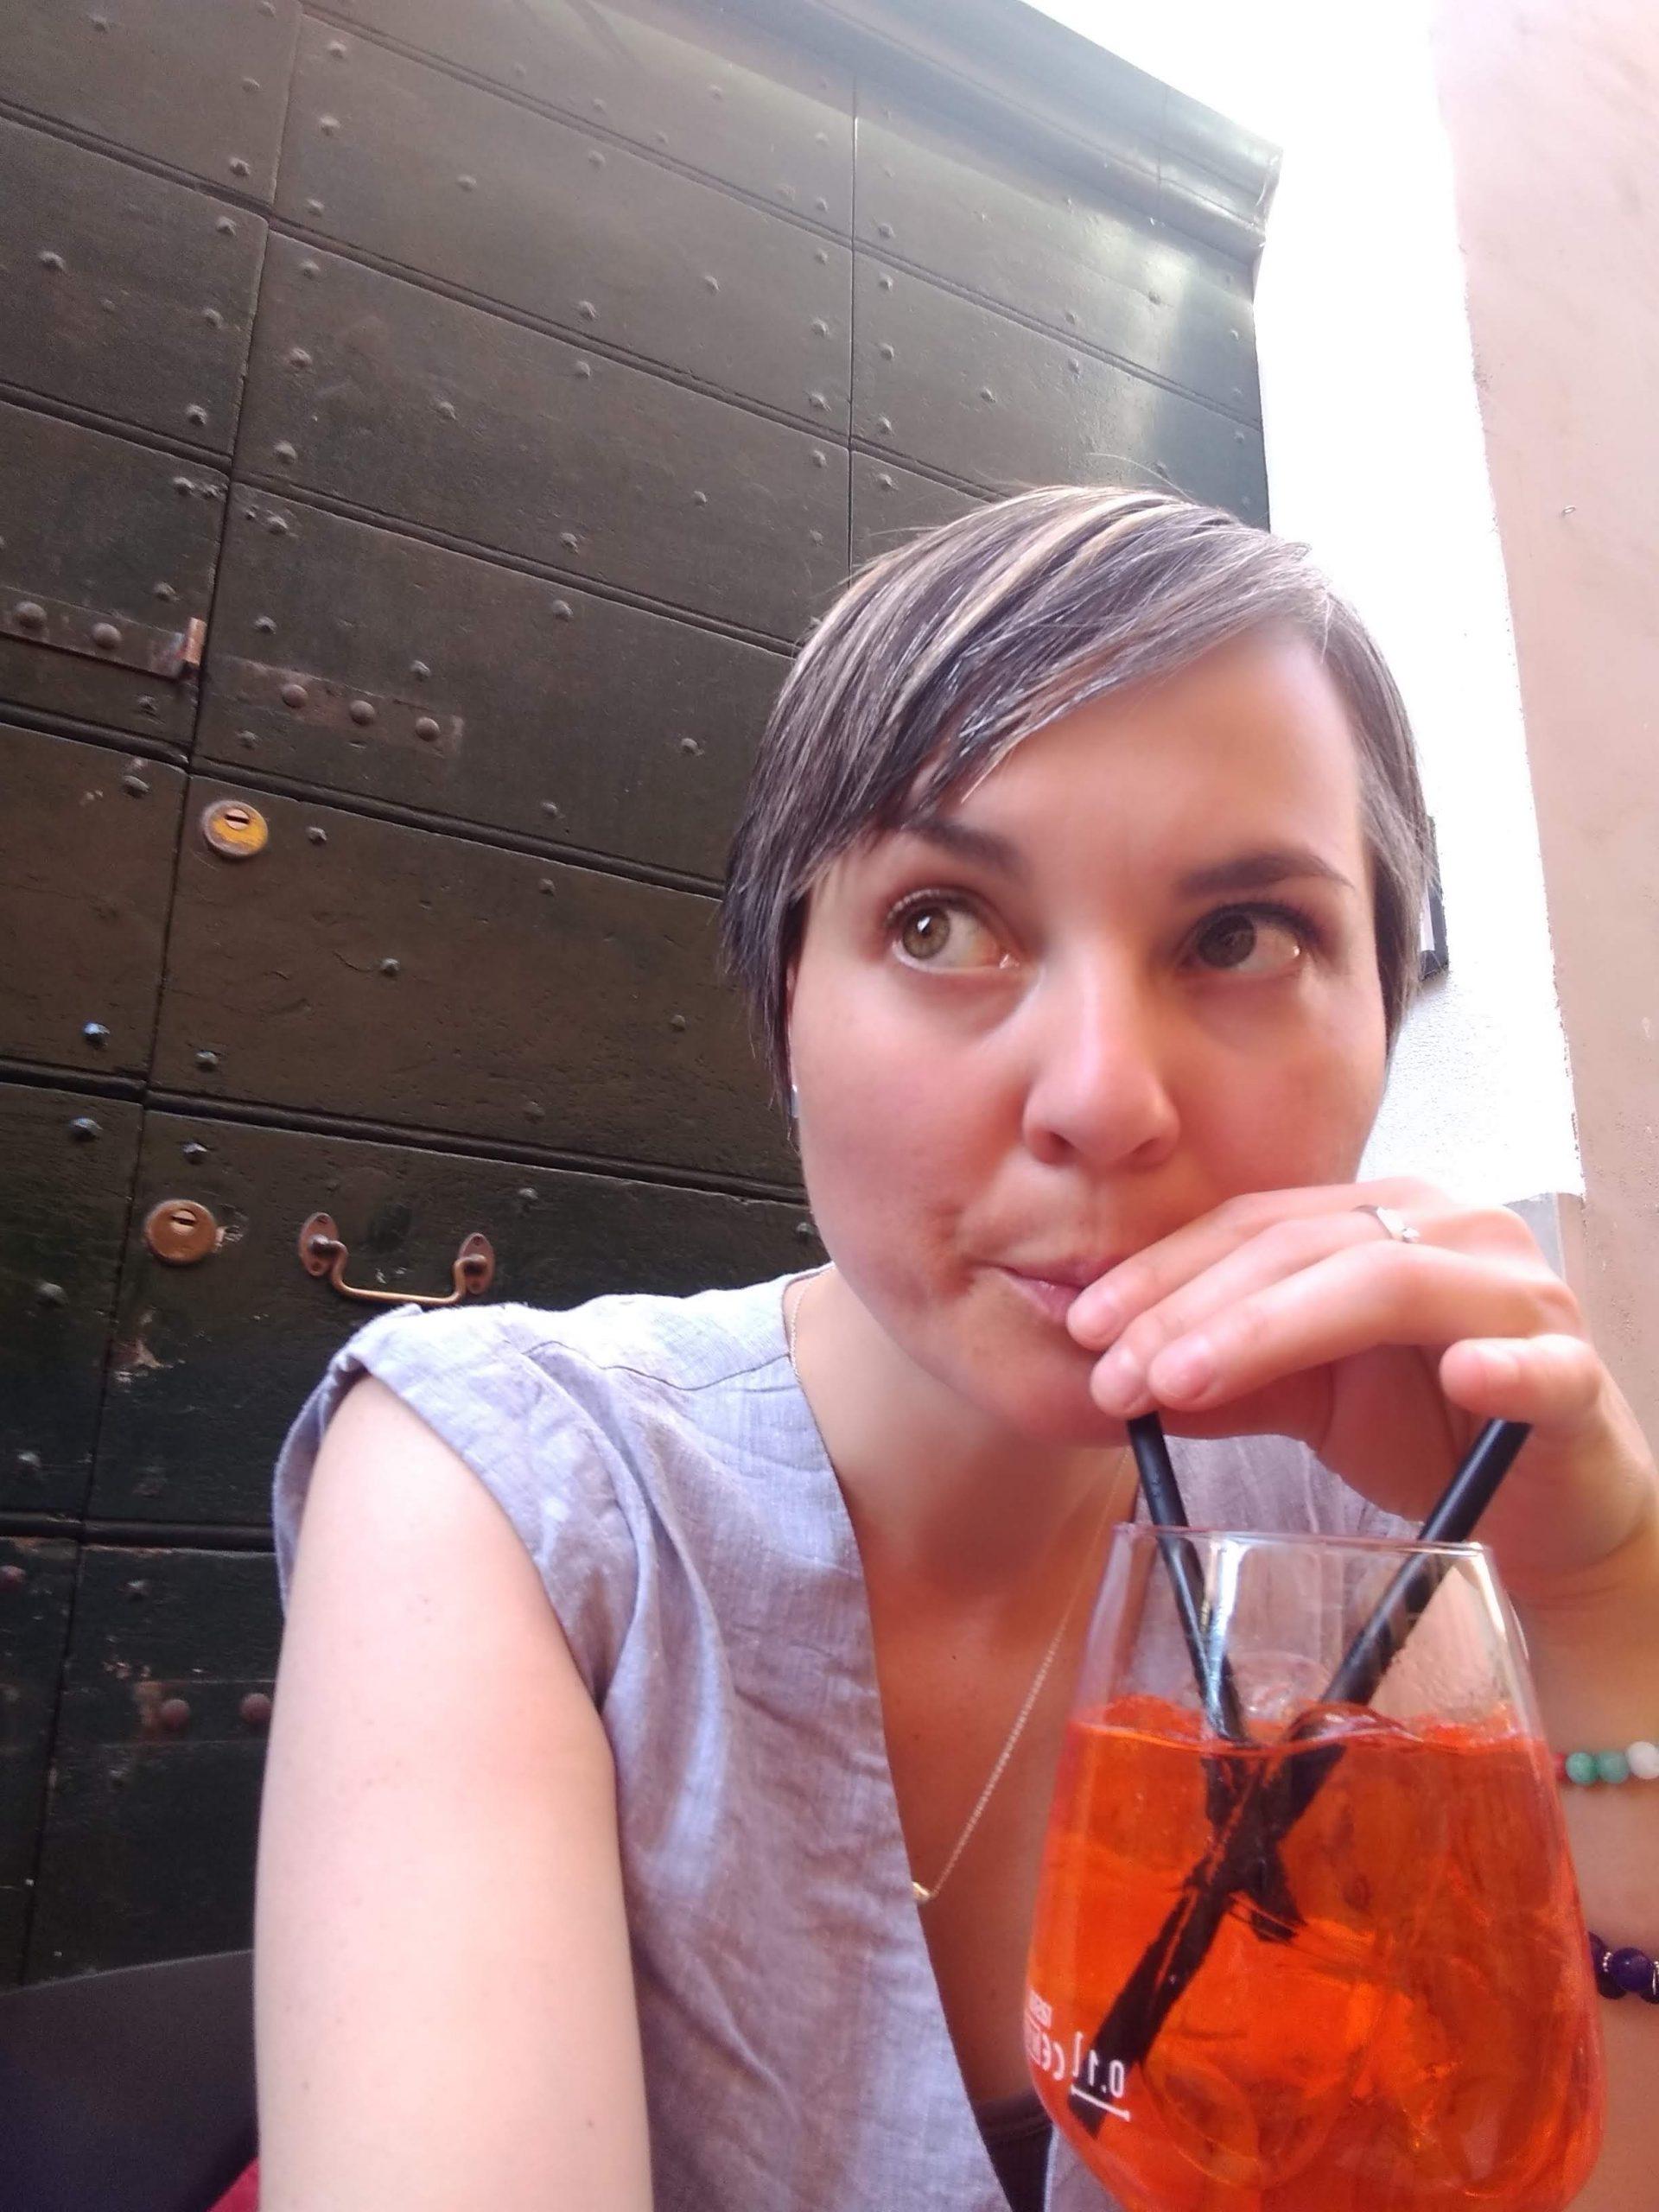 Woman drinking an Aperol Spritz